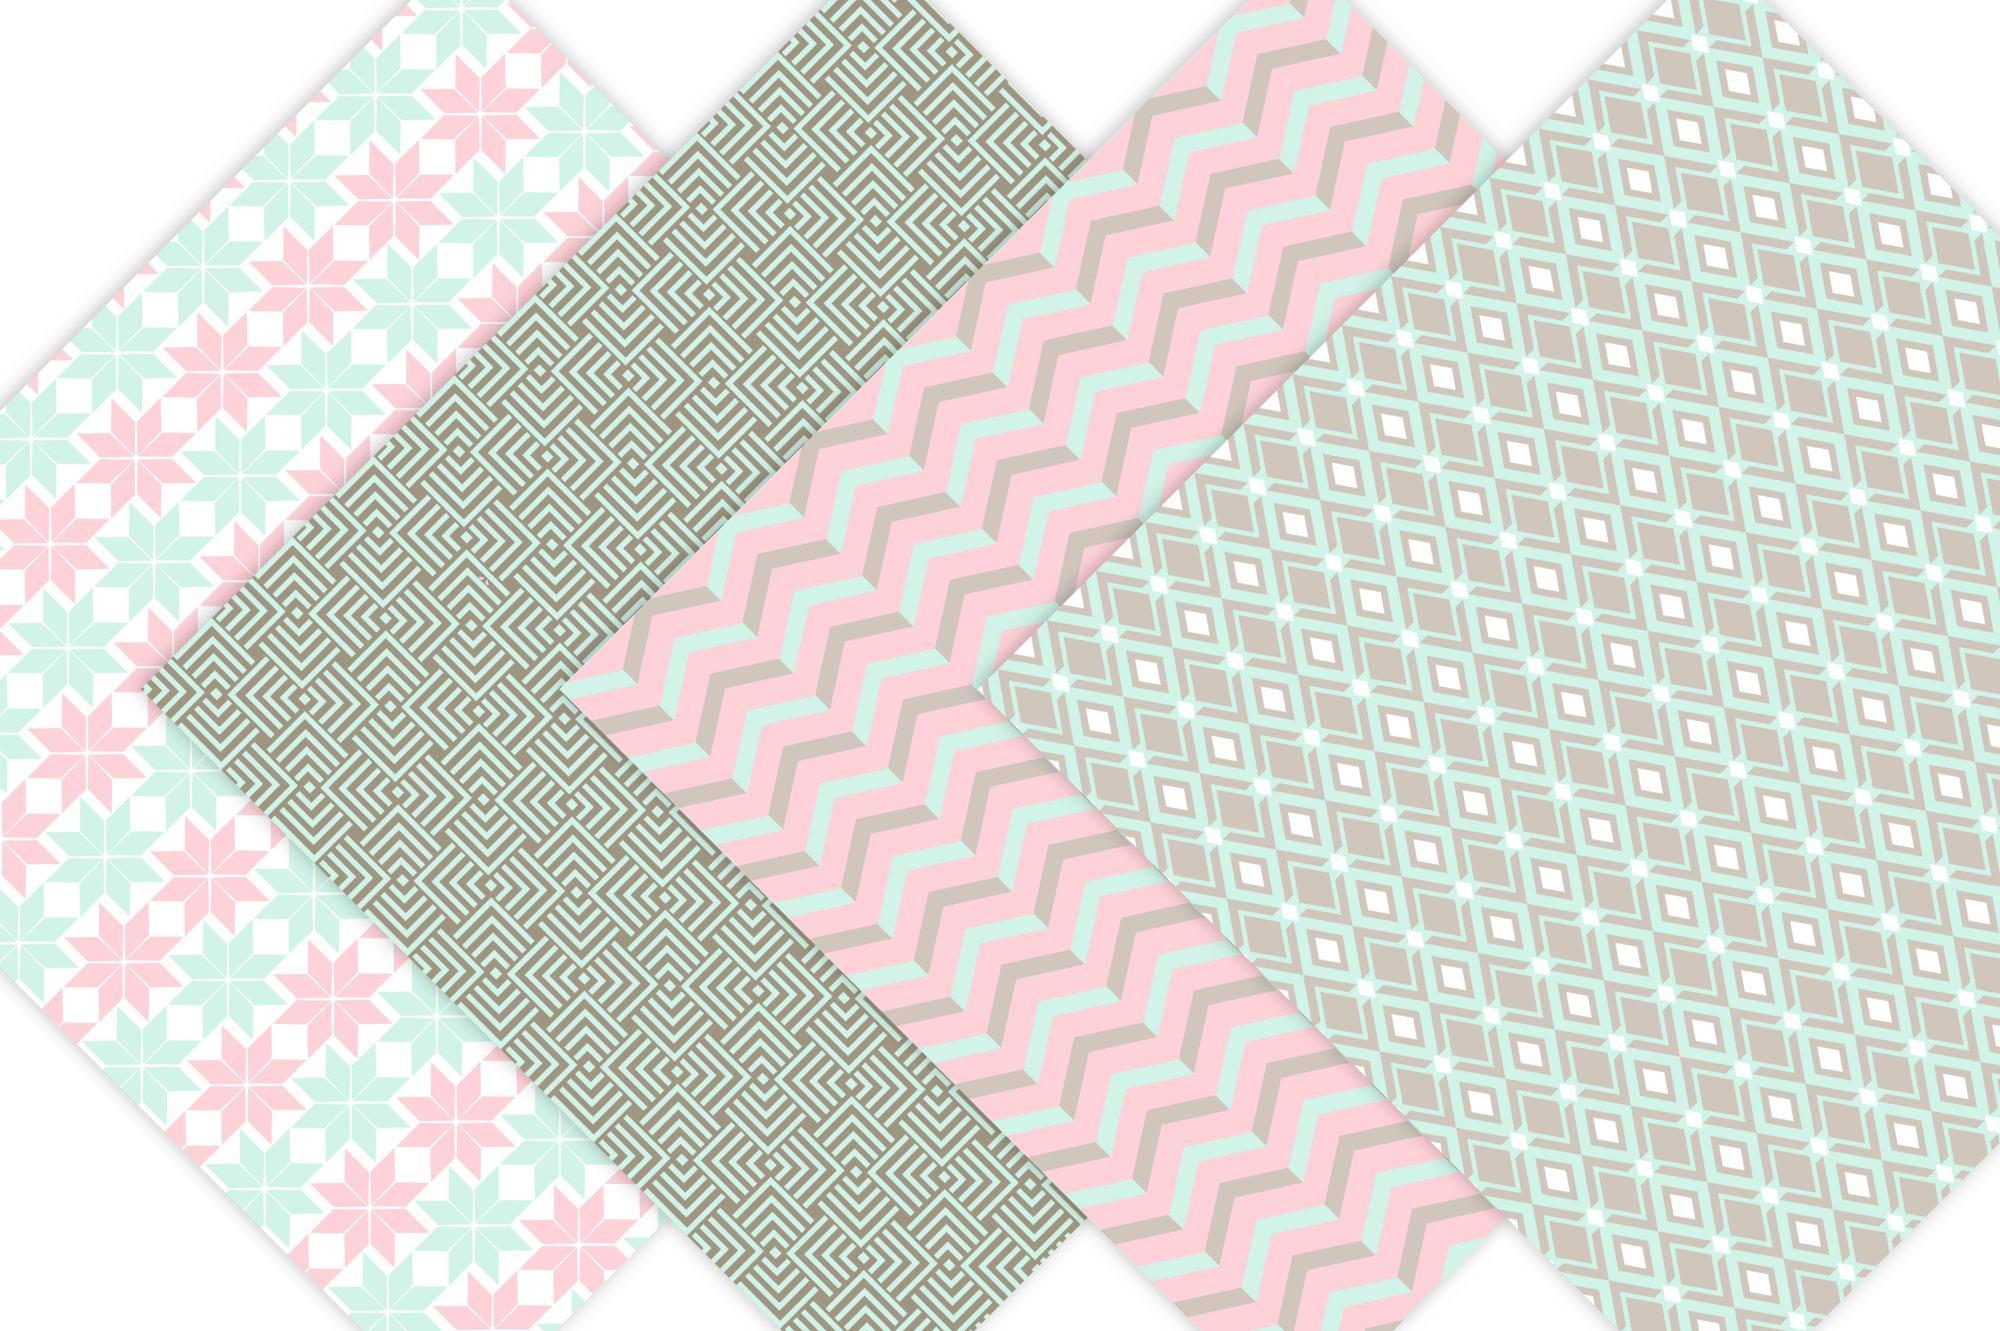 Geometric Digital Paper Patterns example image 5